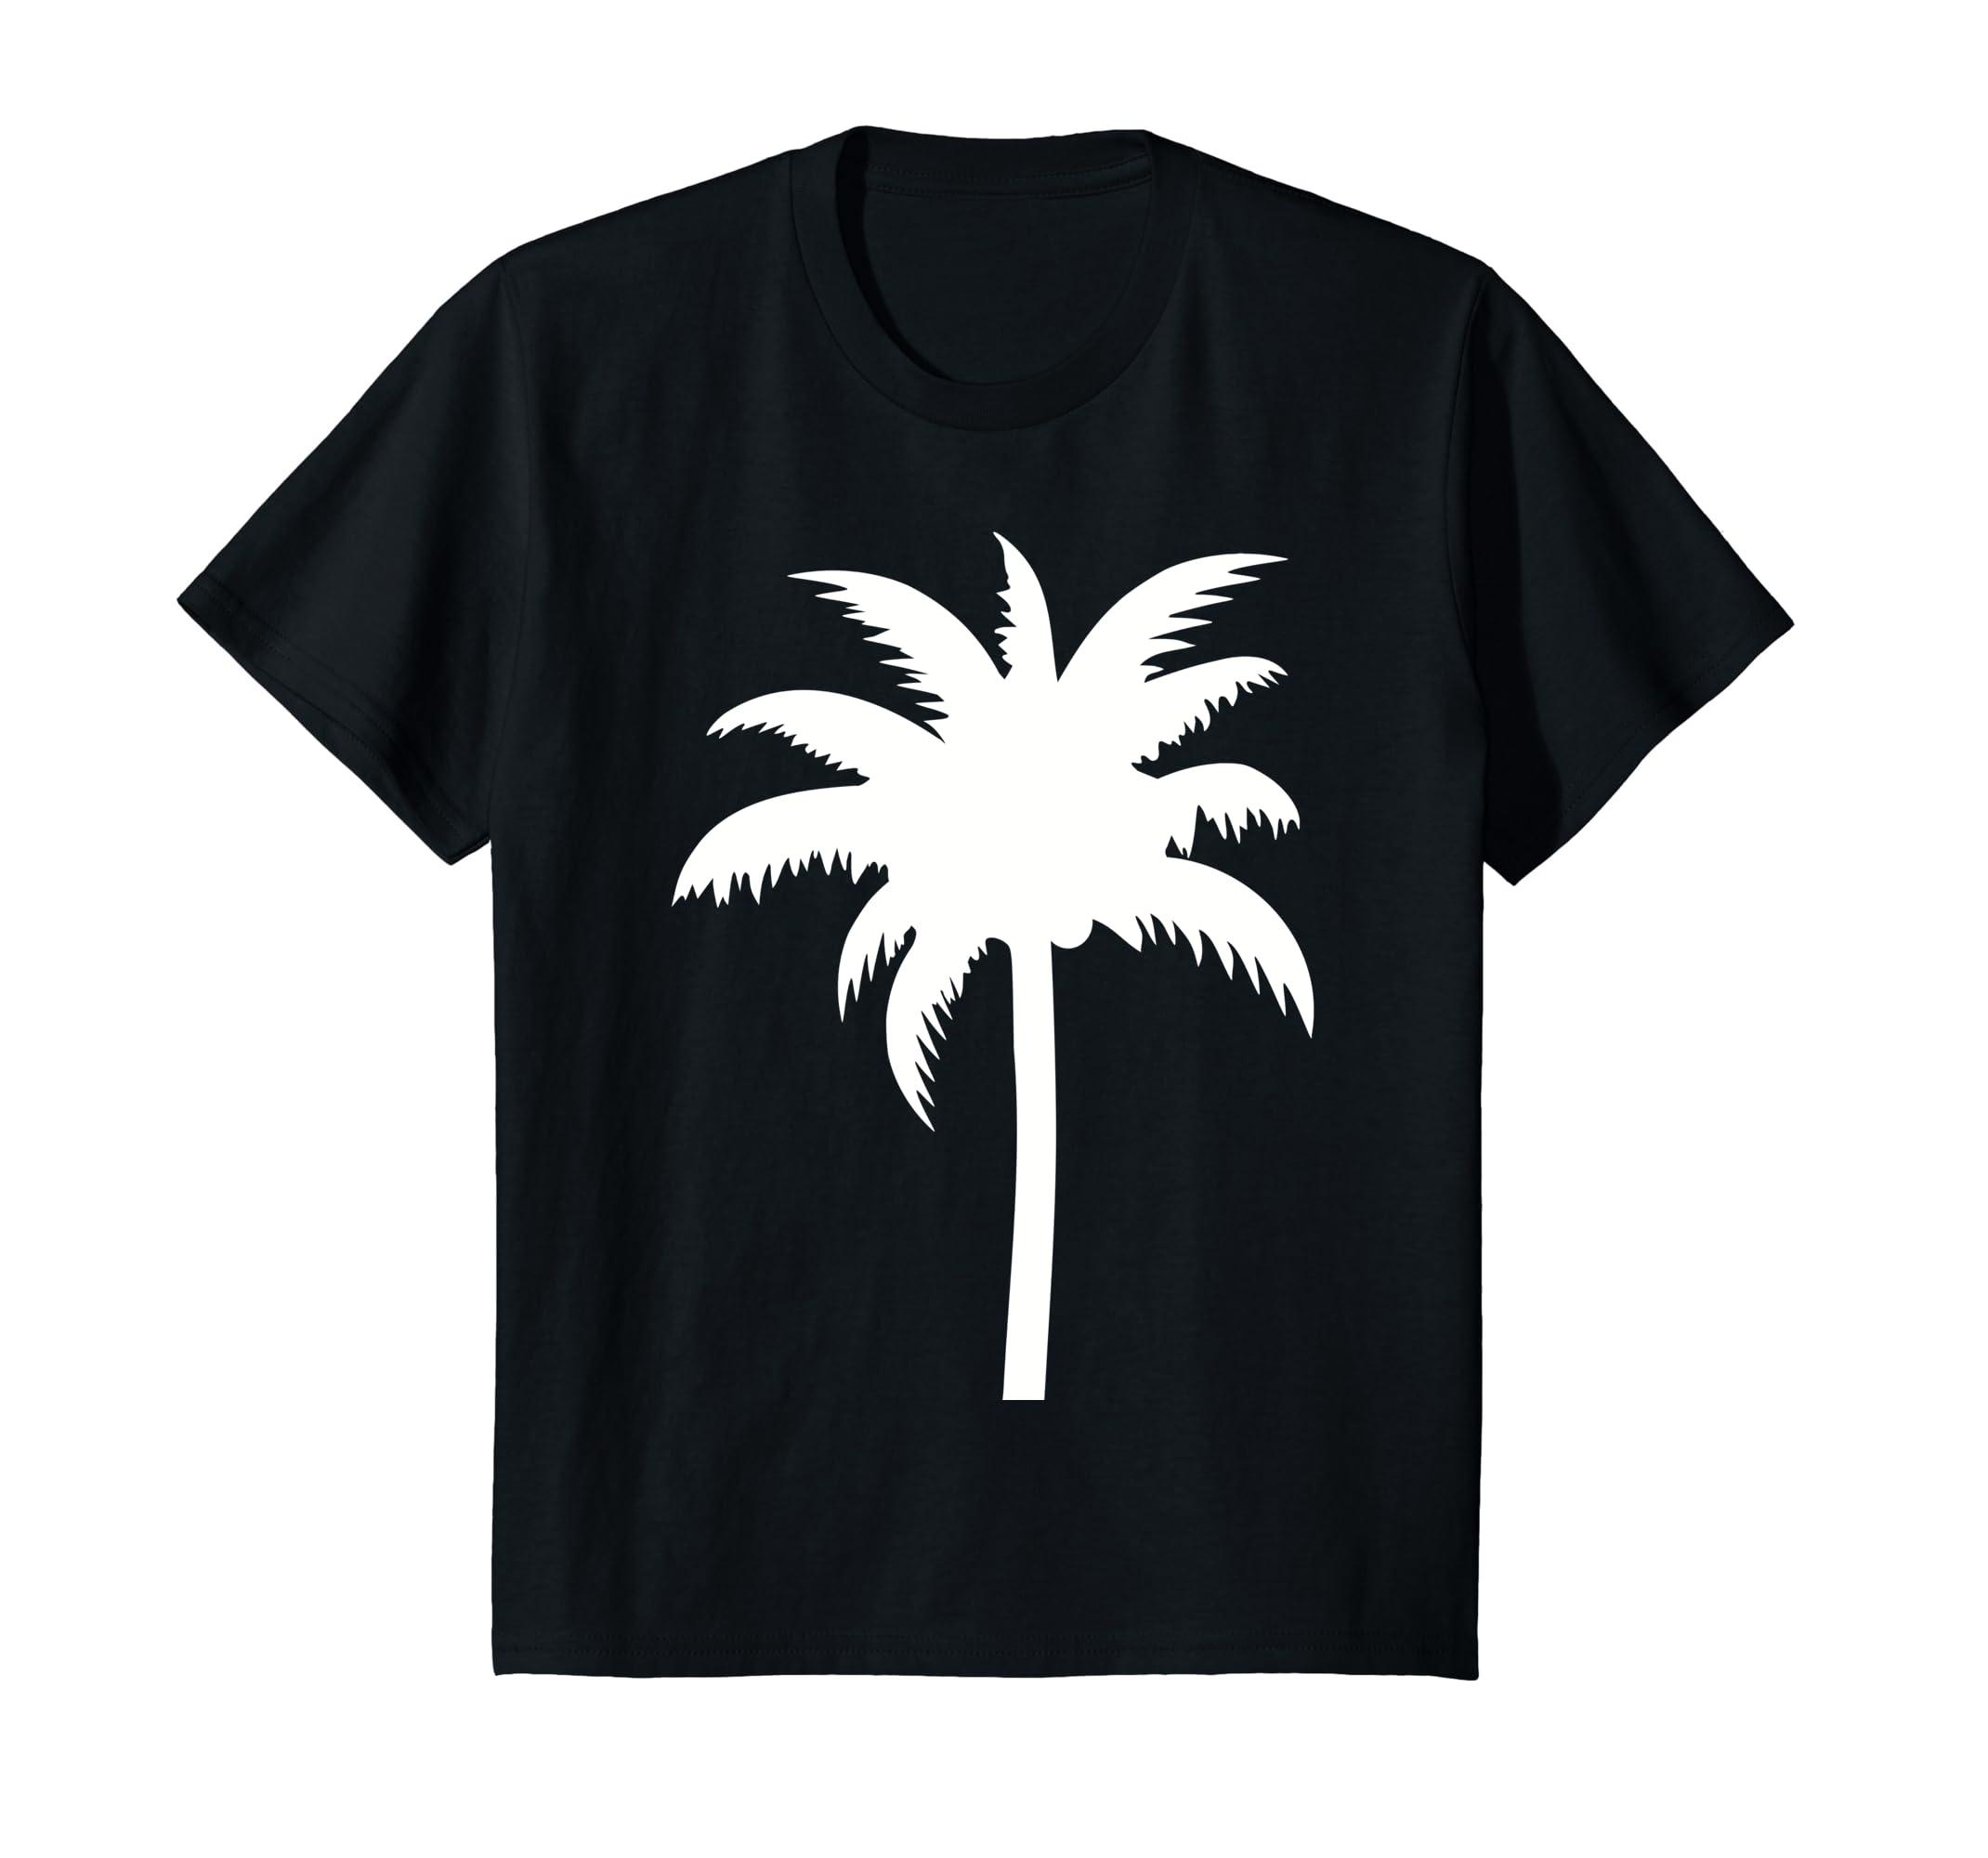 6c0a5645f6 Amazon.com: Palm tree T-Shirt: Clothing